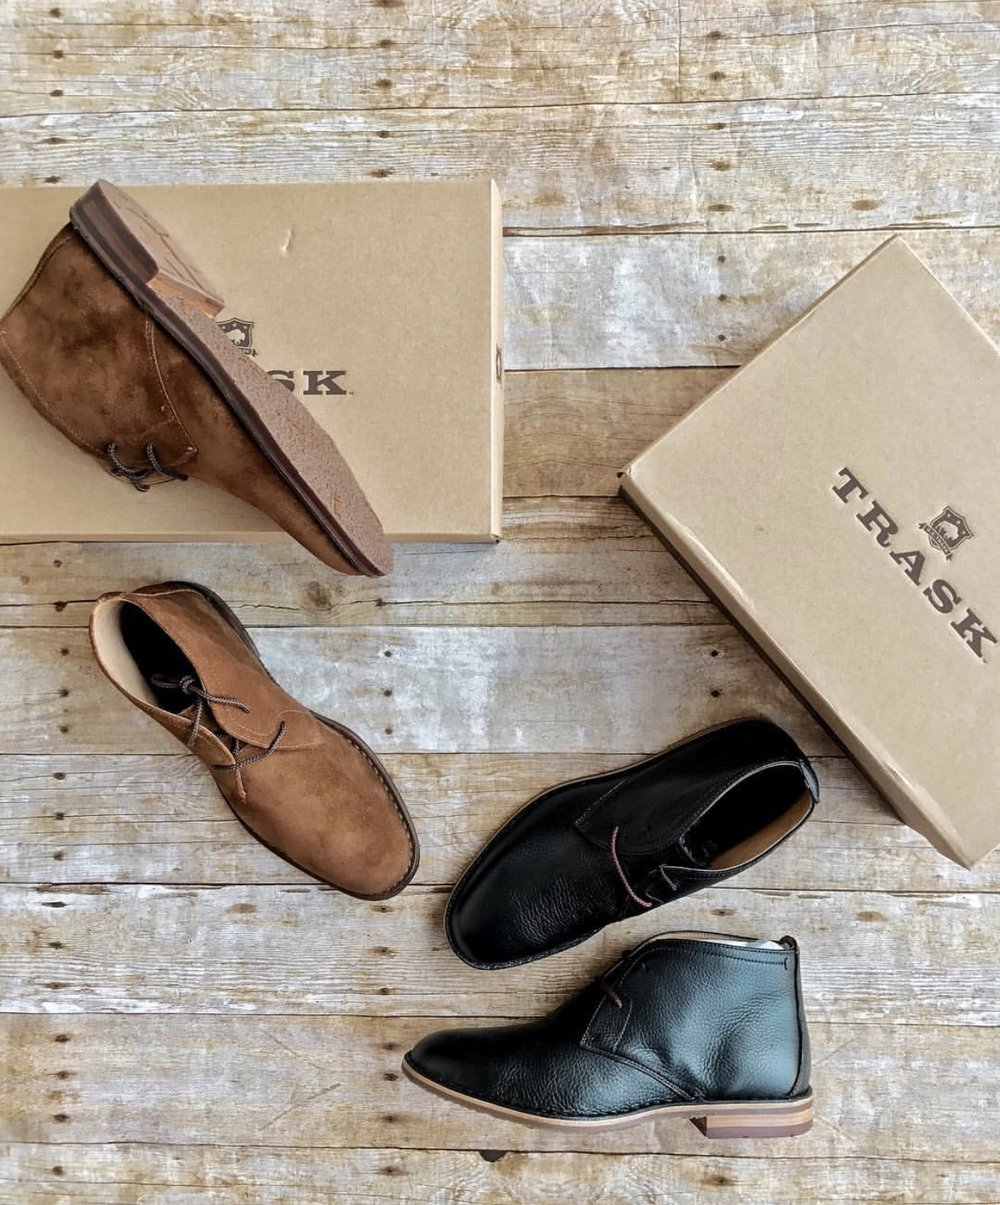 mens-designer-shoes.jpg